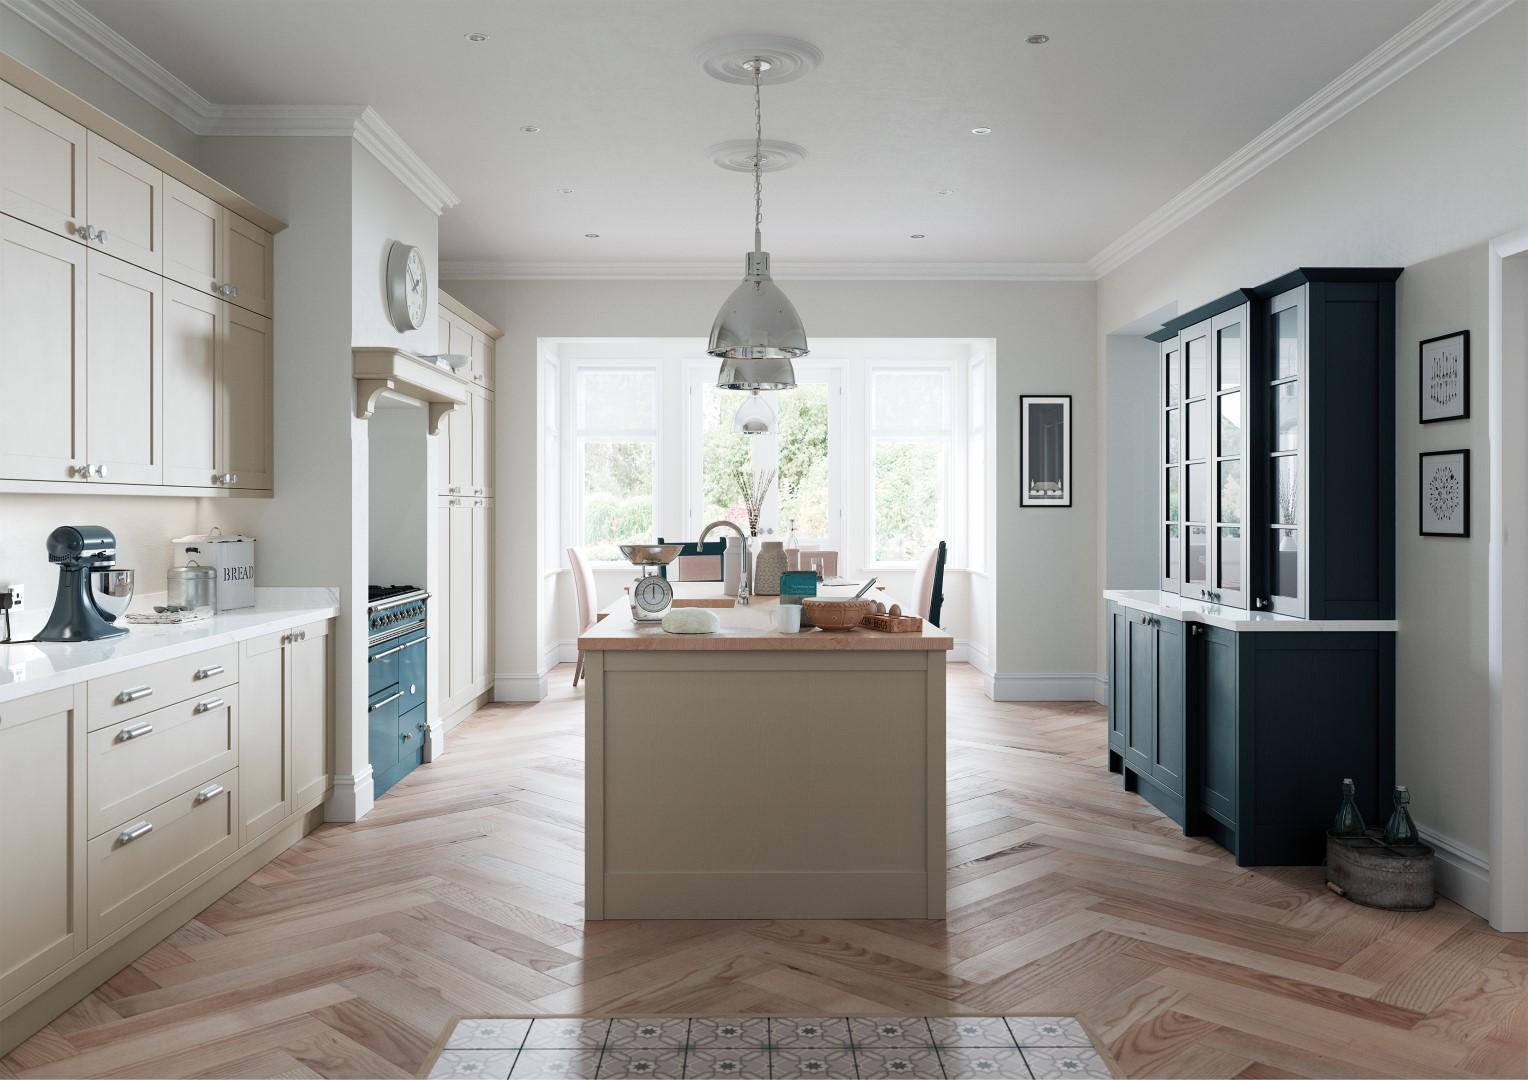 Aldana Stone and Marine - Kitchen Design - Alan Kelly Kitchens - Waterford - 8